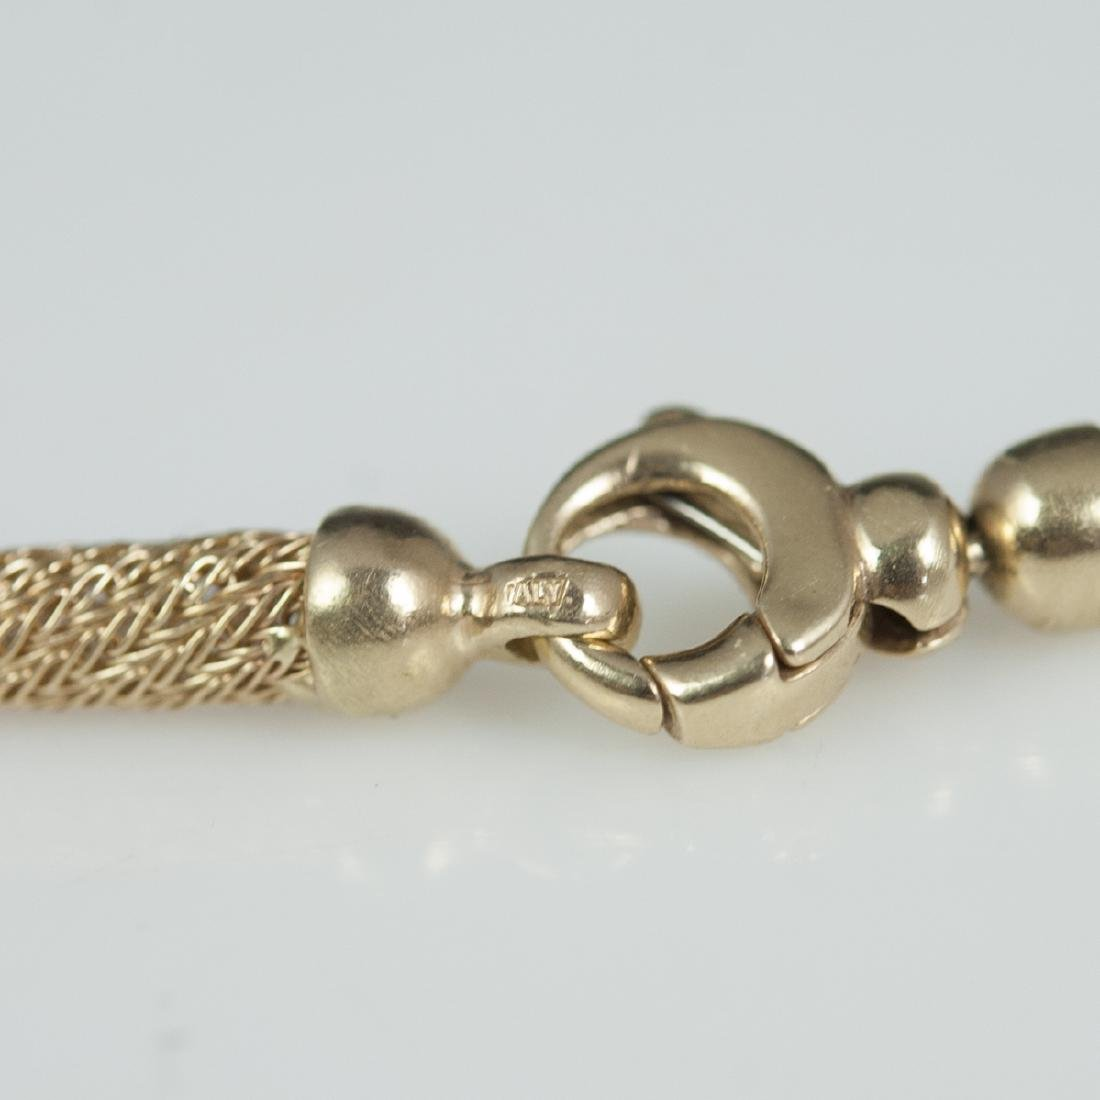 Vintage Italian 14kt Gold Necklace - 3